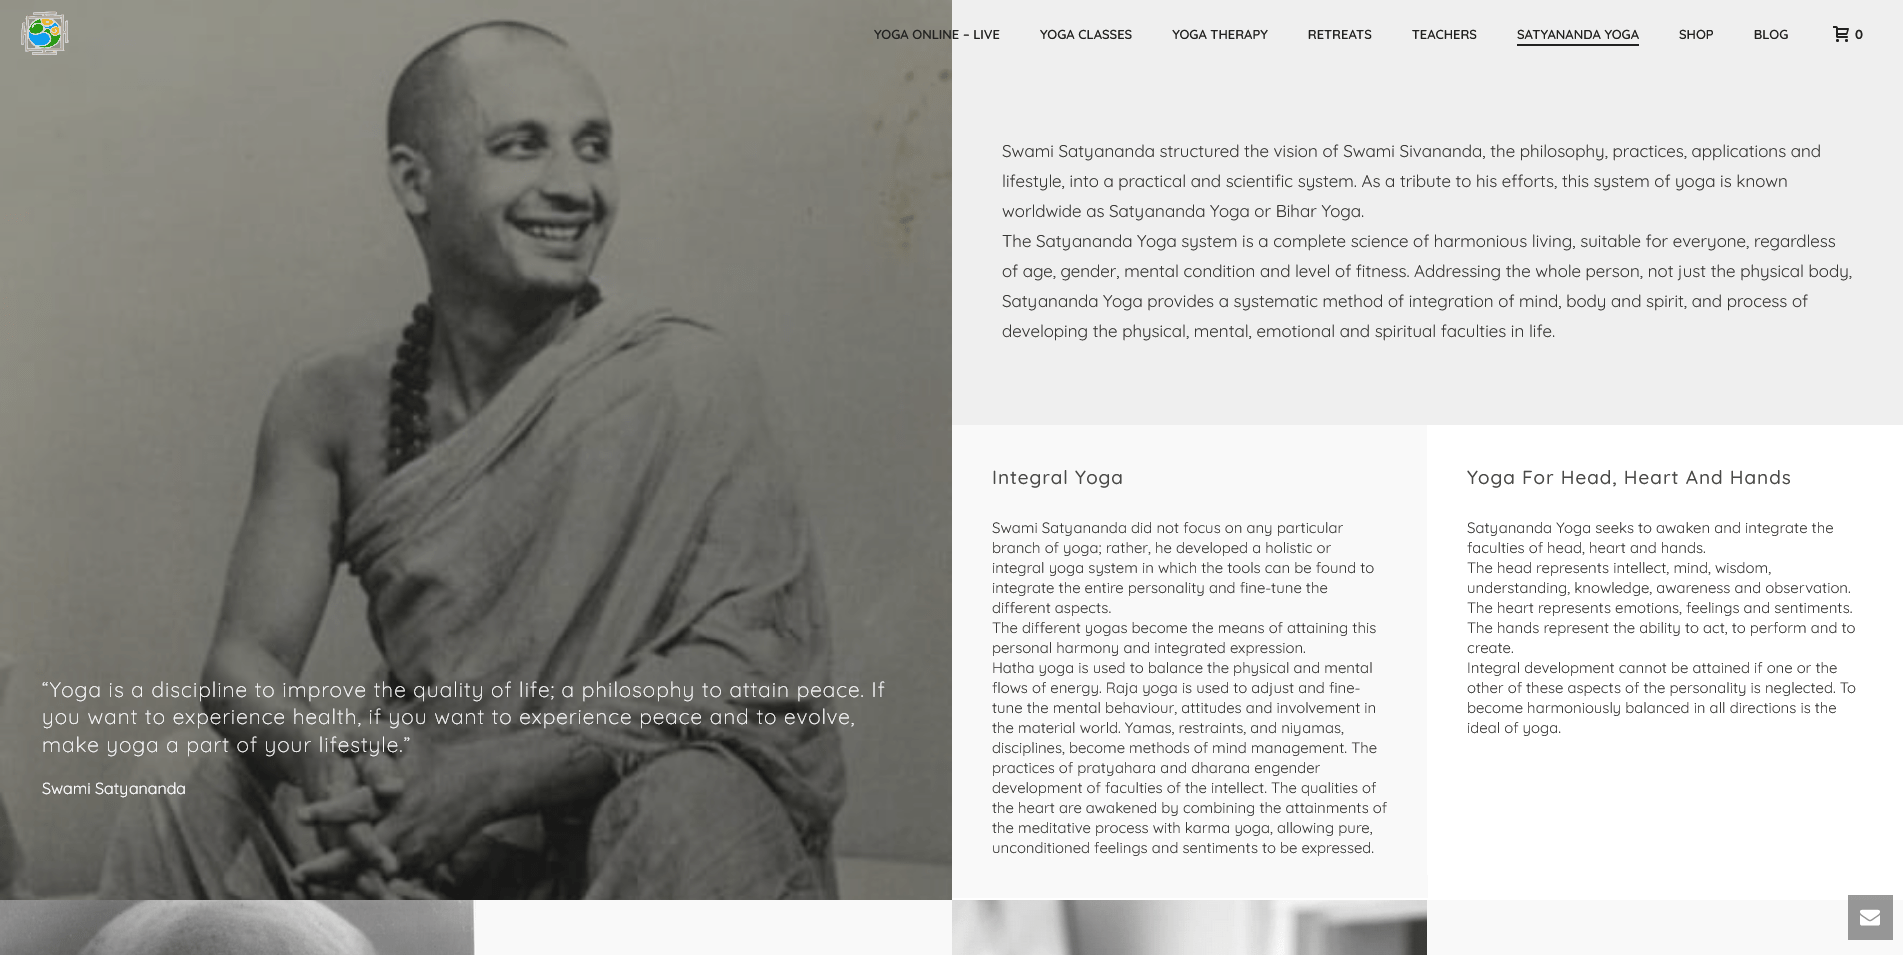 History and teachers Satyananda Yoga